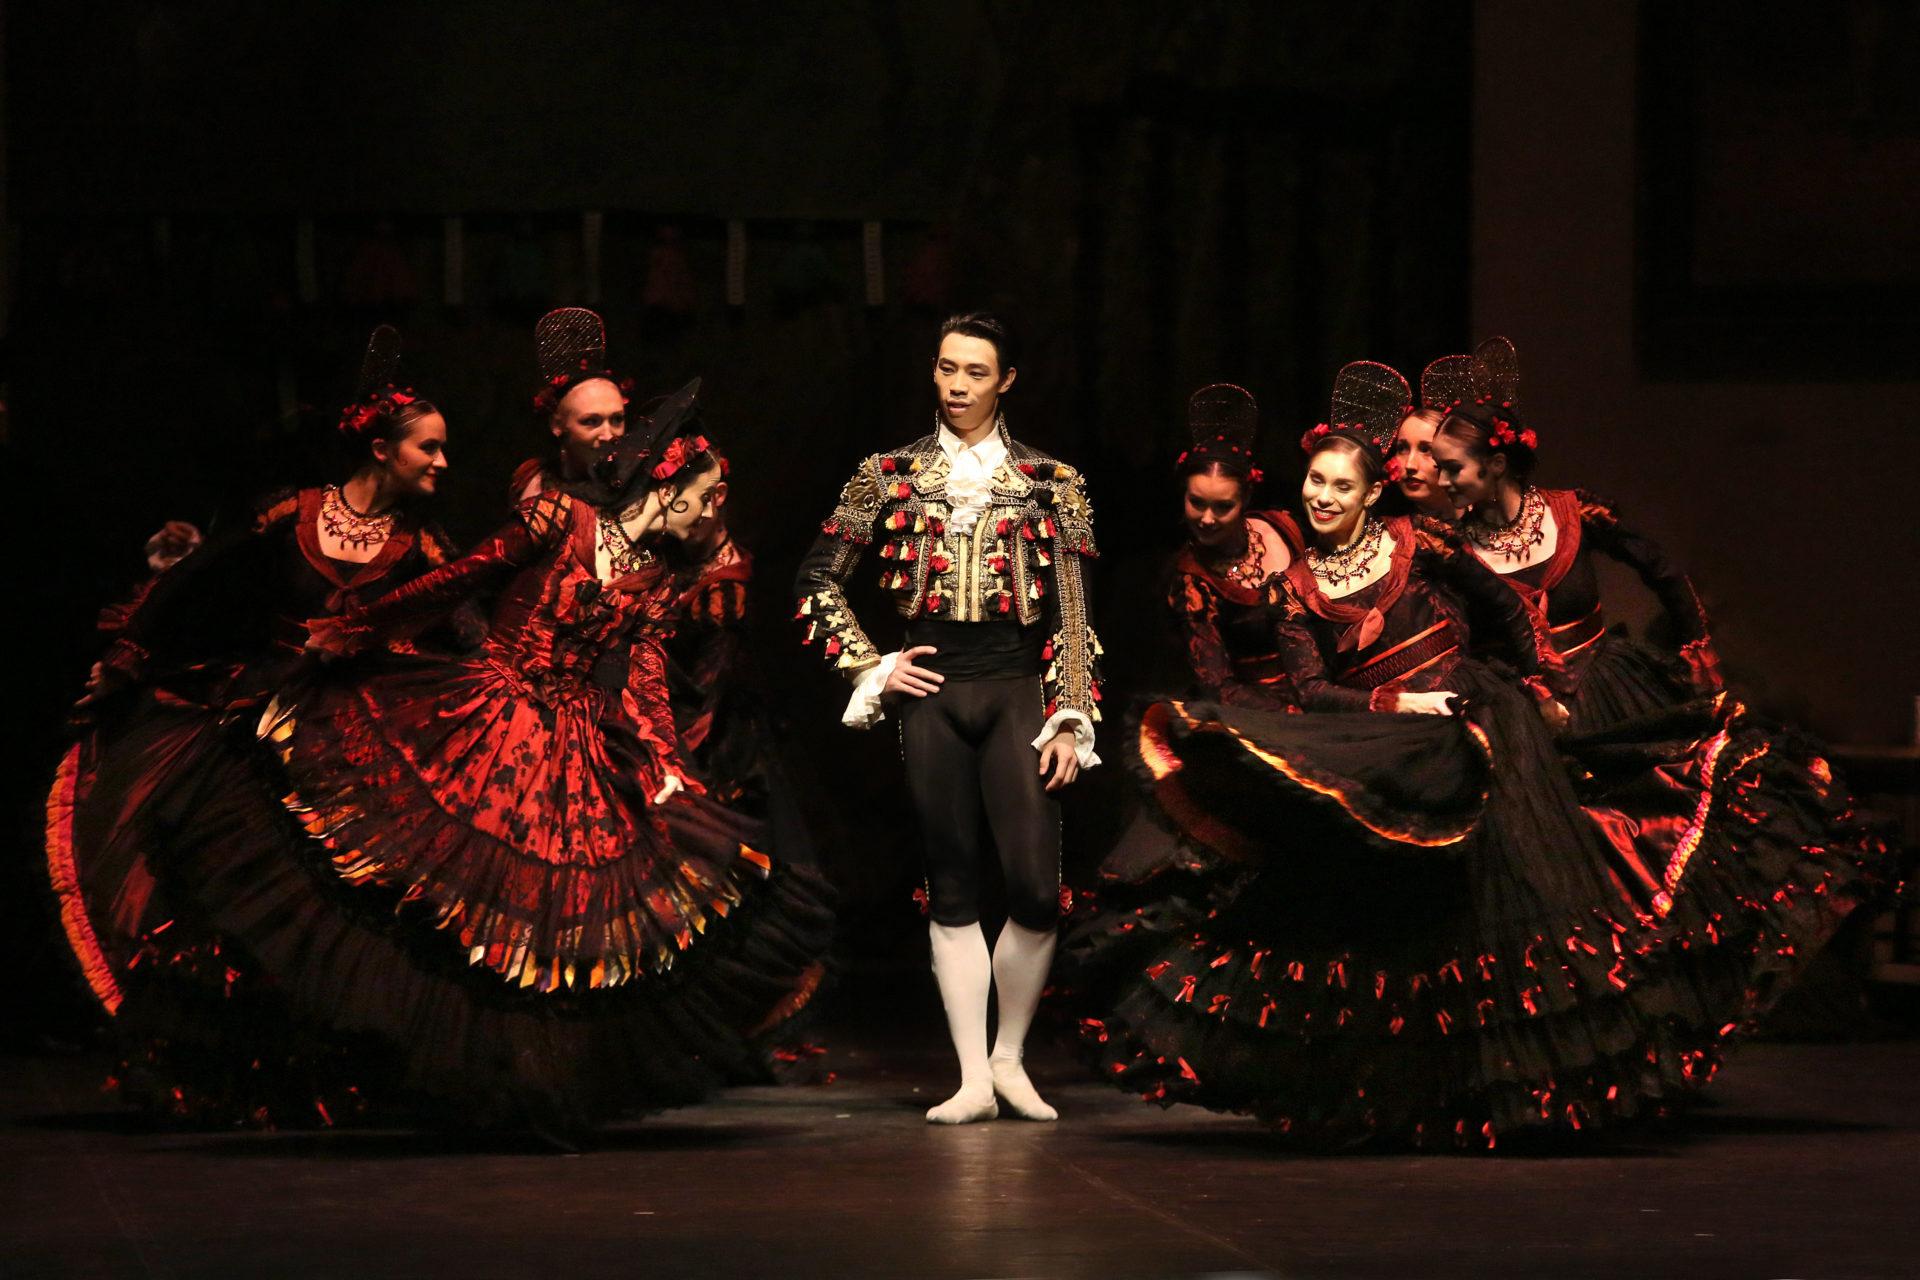 Don_Quixote_HH_Ballett_Foto_AnjaBeutler.de_556